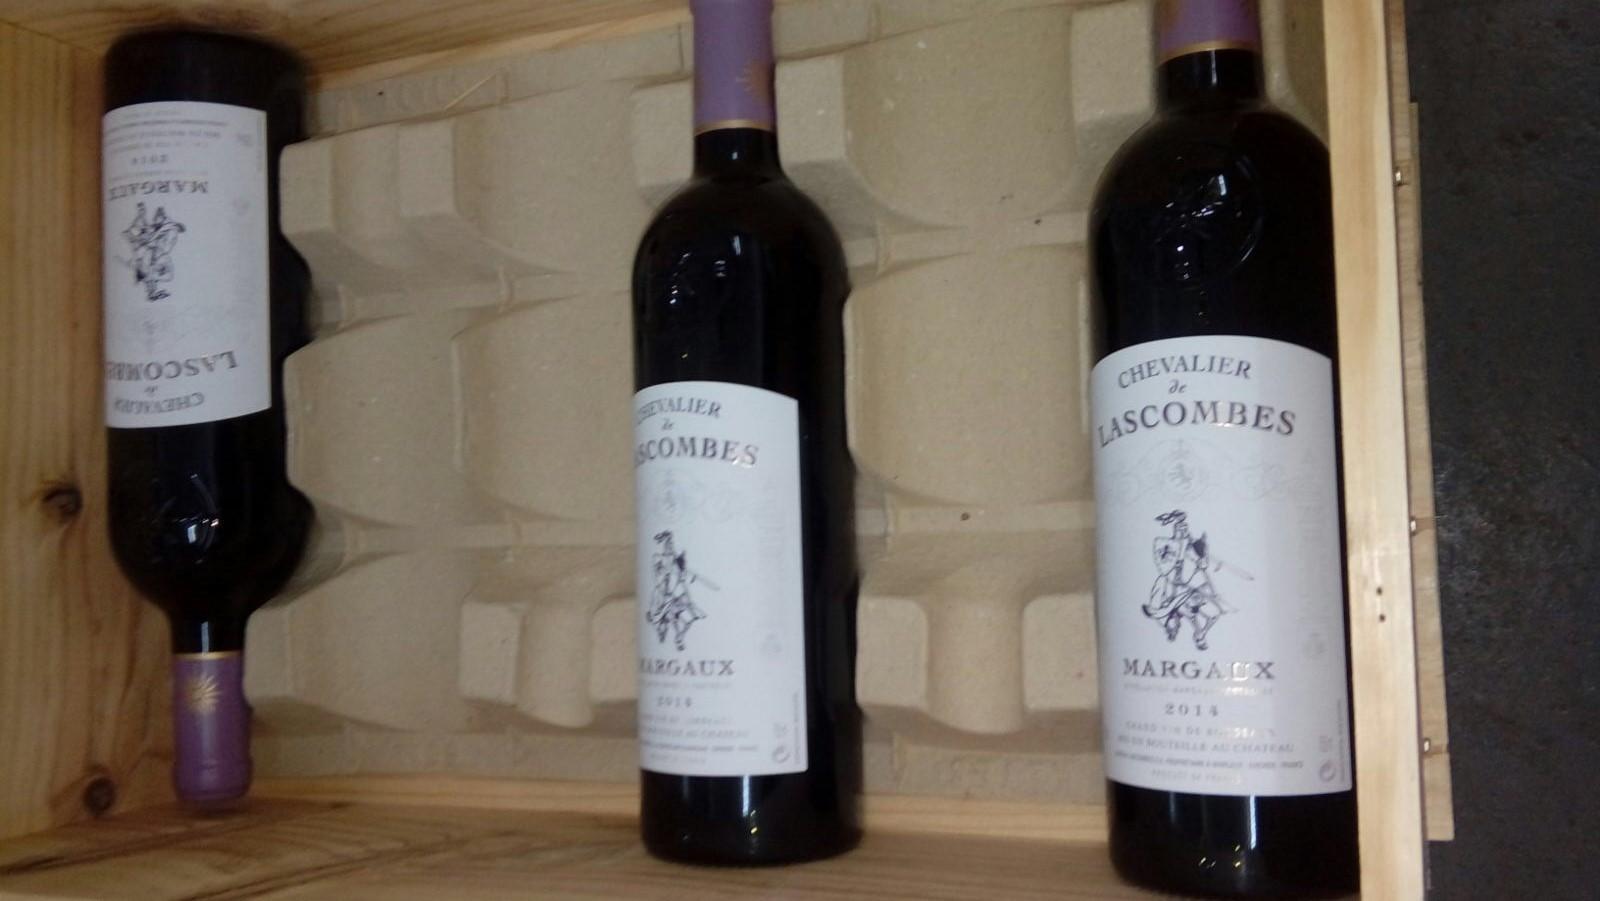 CHEVALIER SCOMBES de NoOSV1 ALIER OMBES MARGALX 2014,wine,bottle,alcoholic beverage,wine bottle,drink